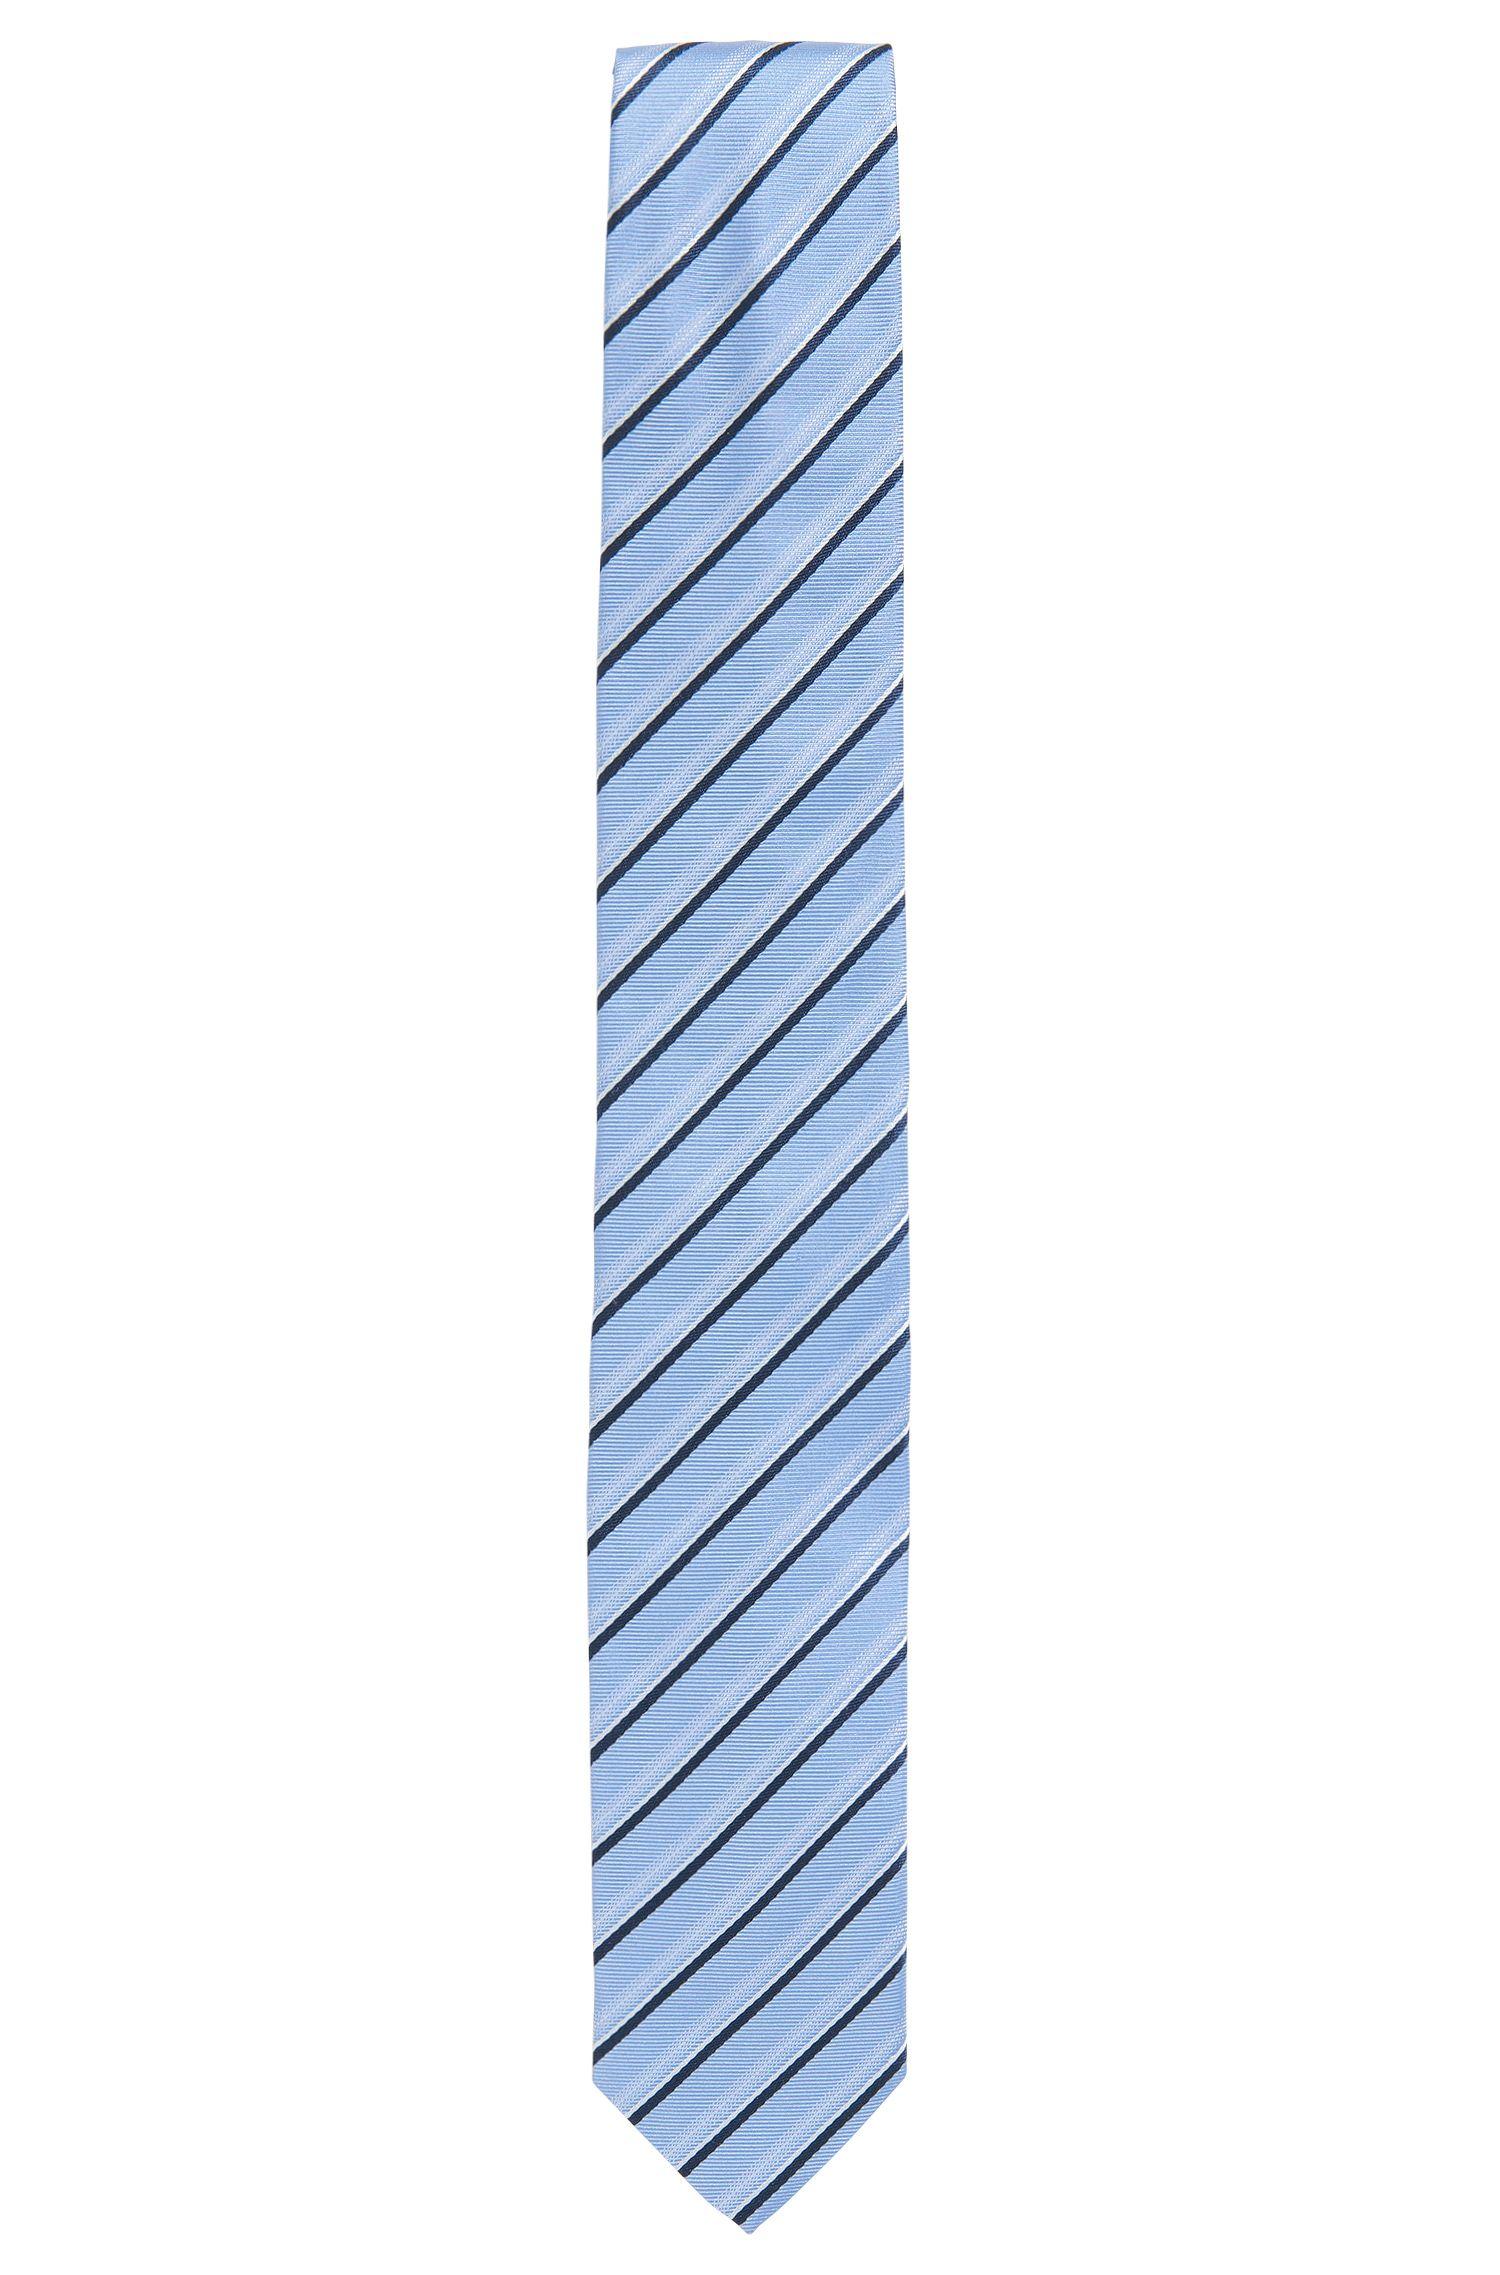 Gestreifte Krawatte aus Seiden-Jacquard